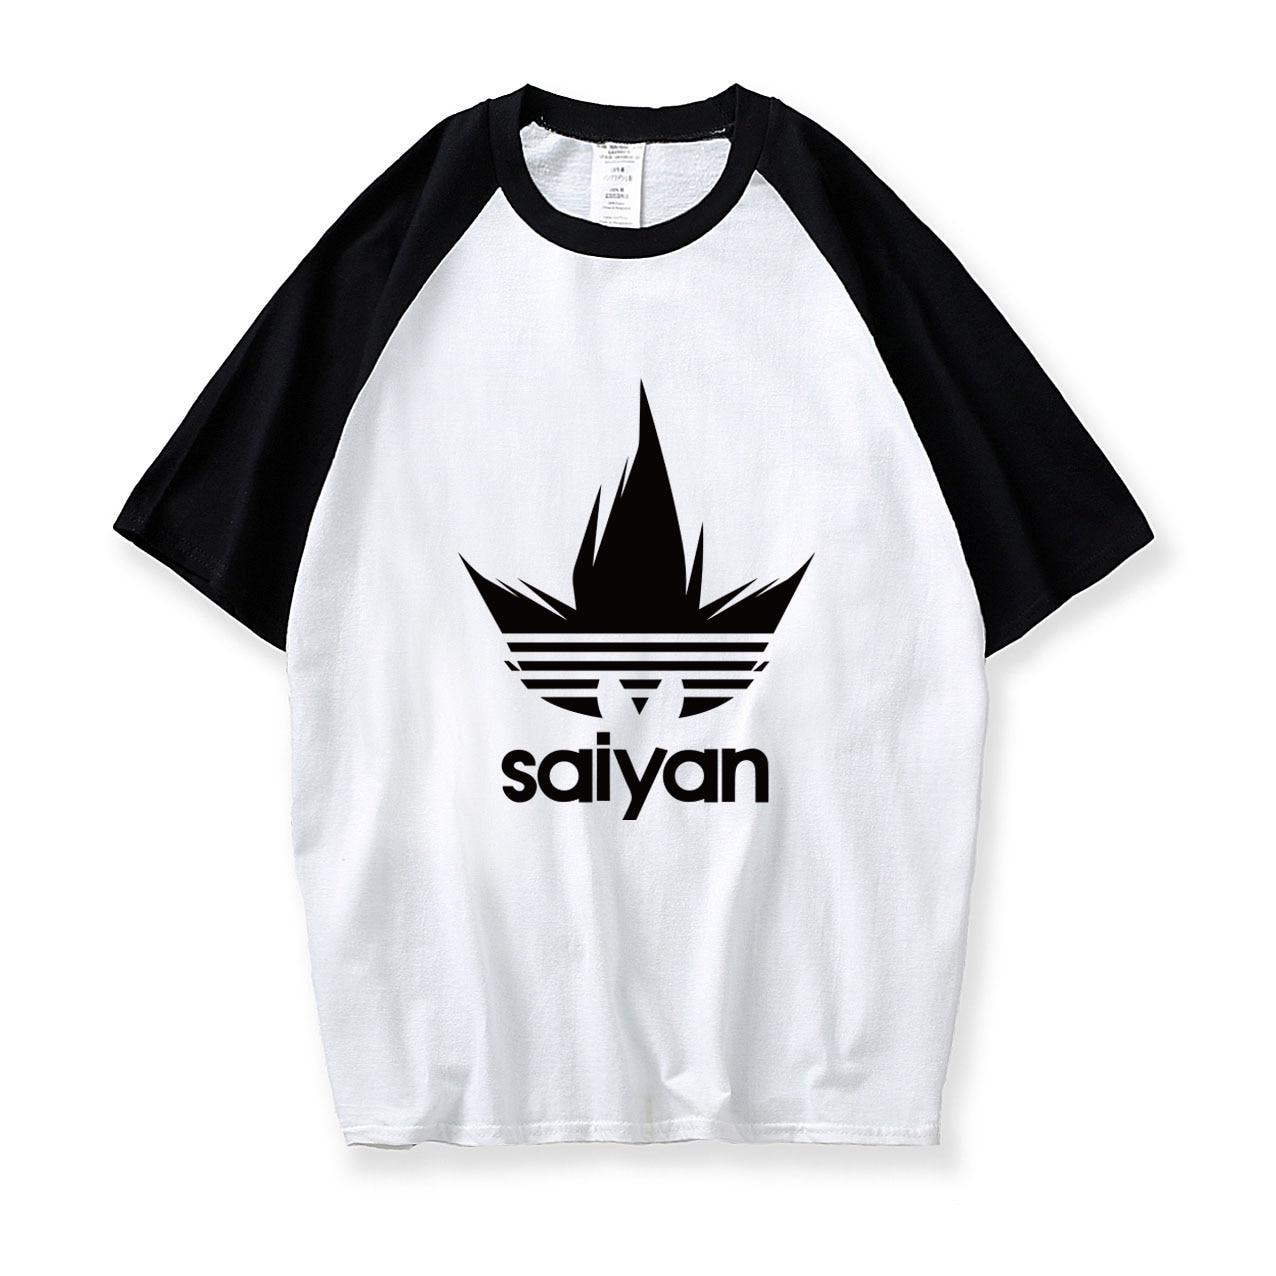 Cotton tops Dragon Ball Z T-Shirts 2019 Fitness Evolution T-Shirt Men casual raglan Short Sleeve O-neck super Saiyan tee shirts